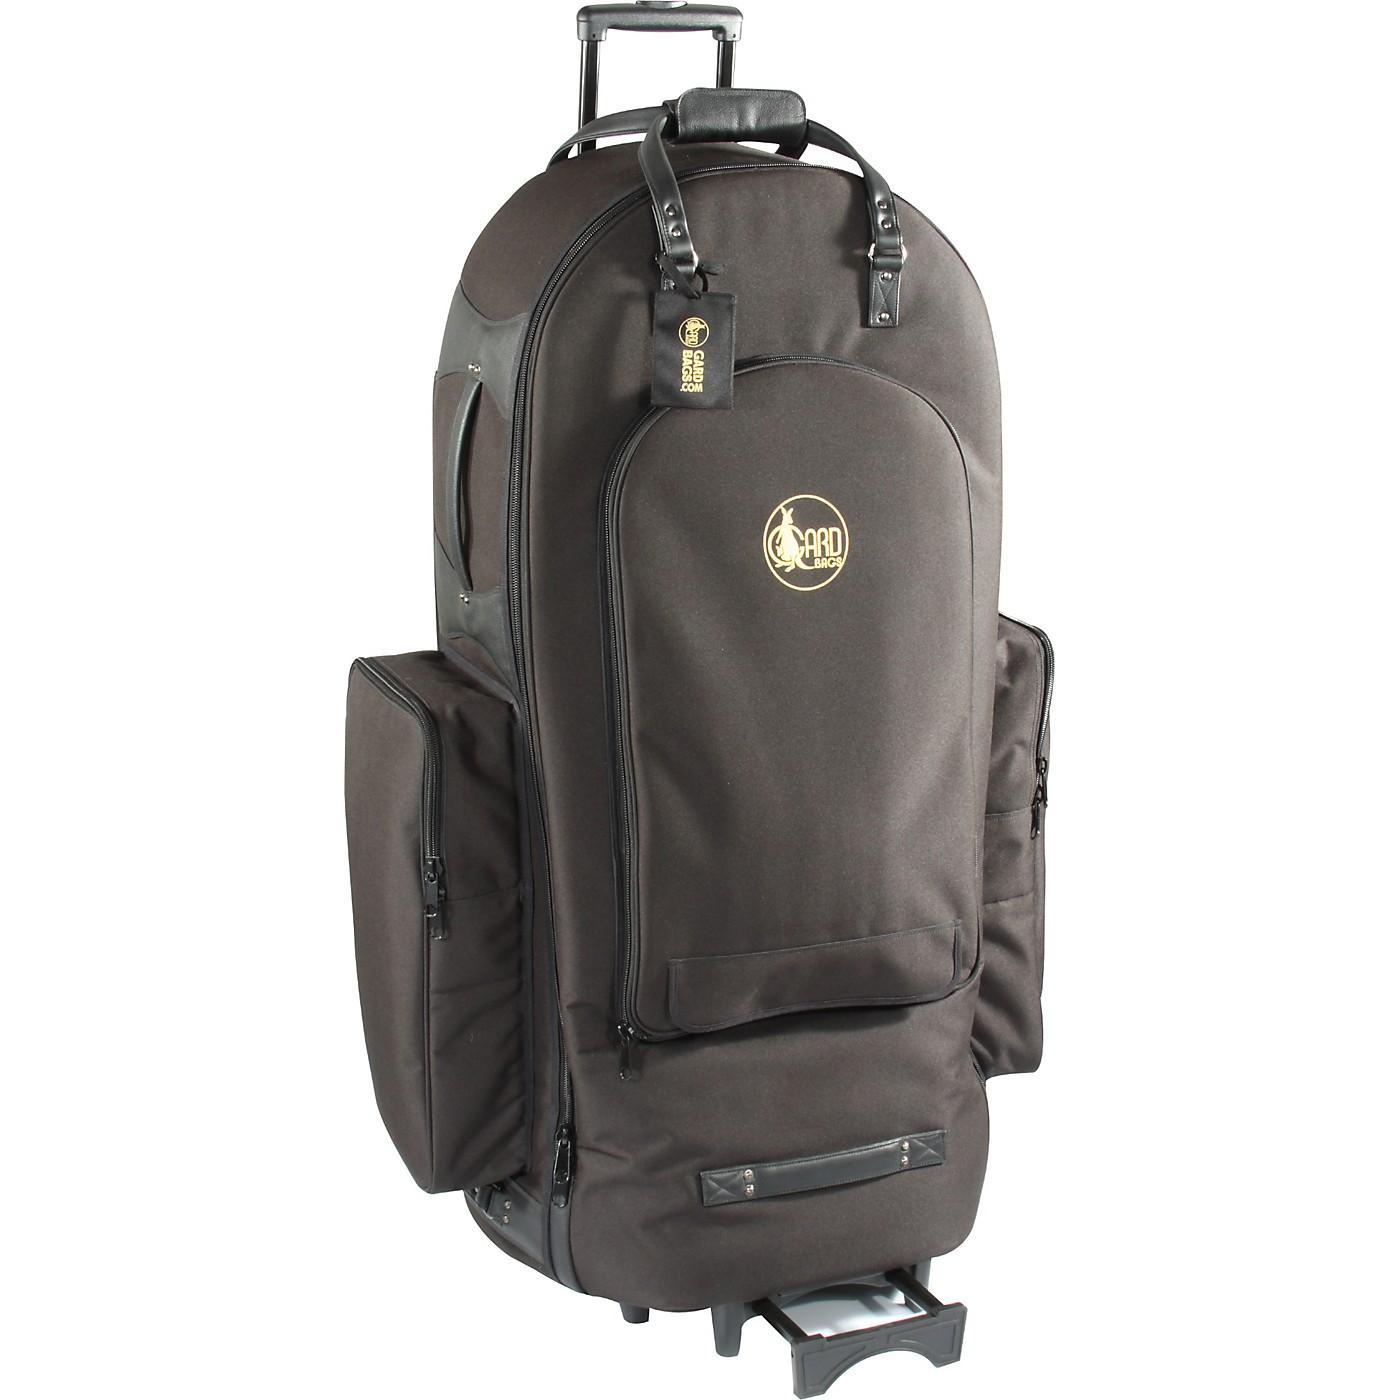 Gard 3/4 Tuba Wheelie Bag thumbnail